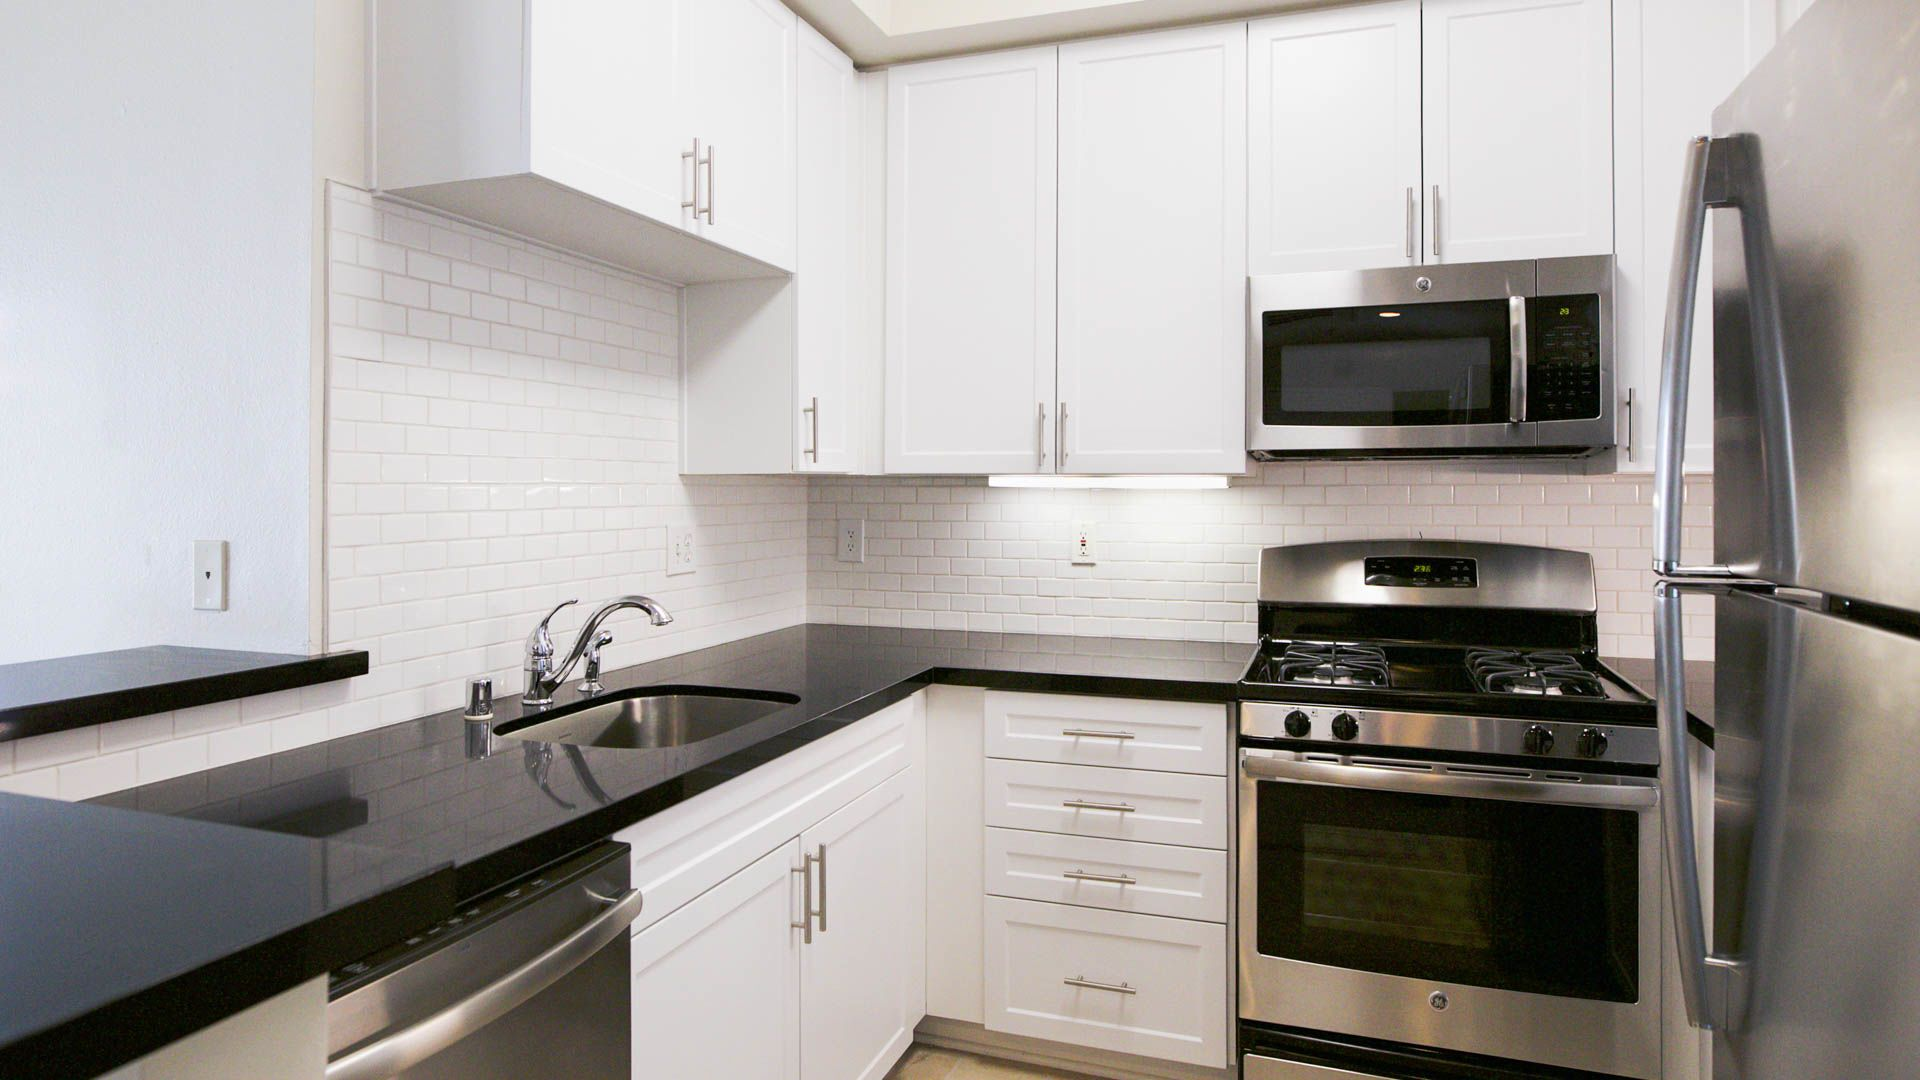 Westside on Bundy Apartments - Kitchen